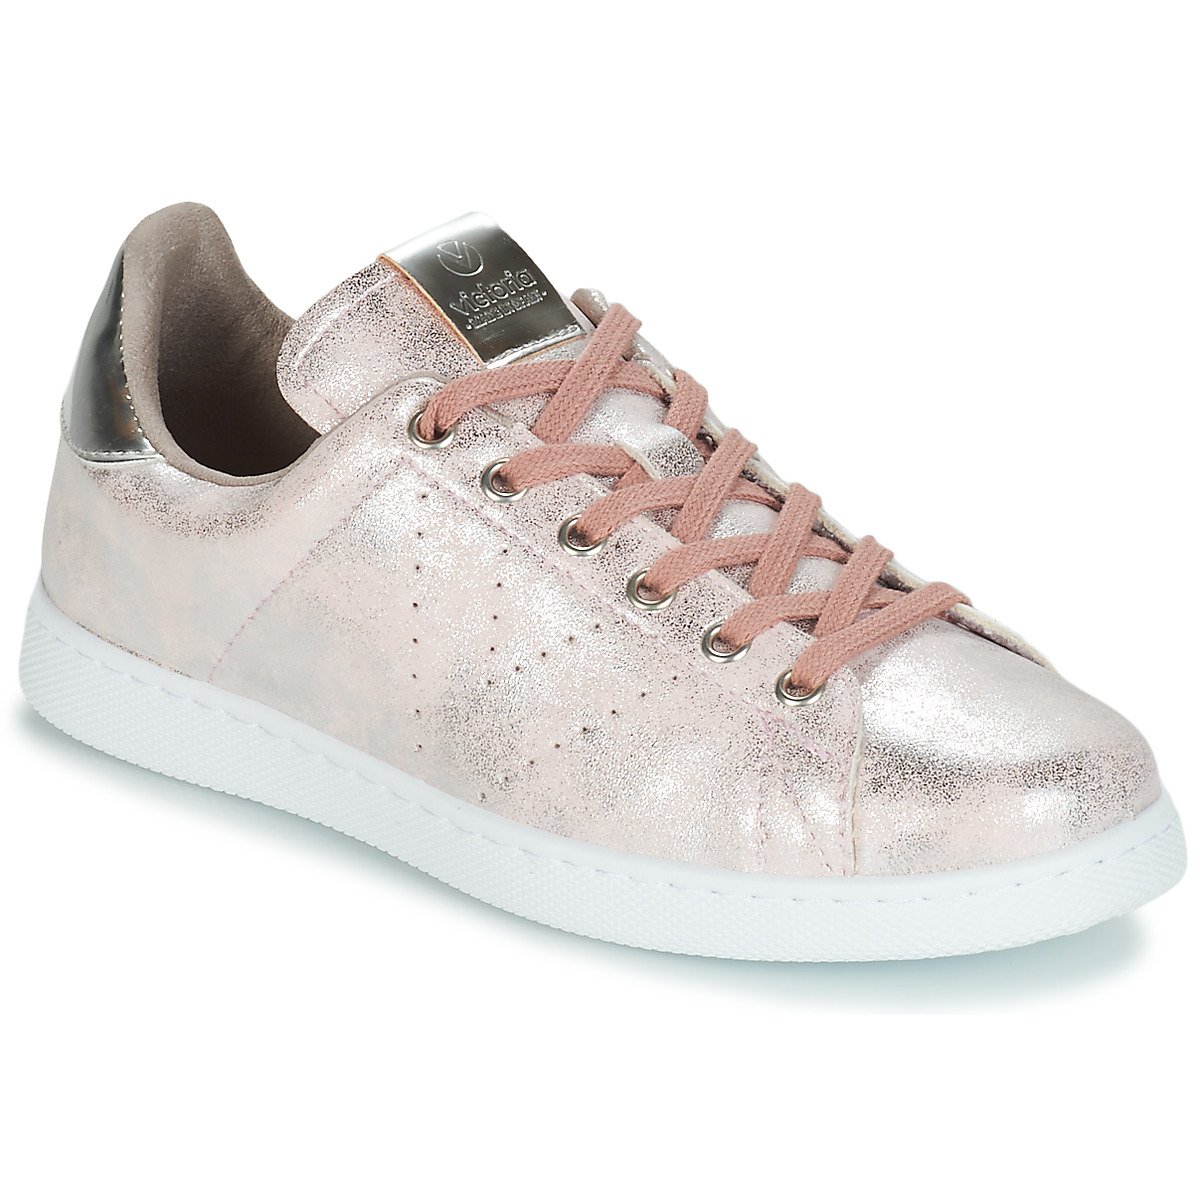 Sneakers Victoria  TENIS METALIZADO